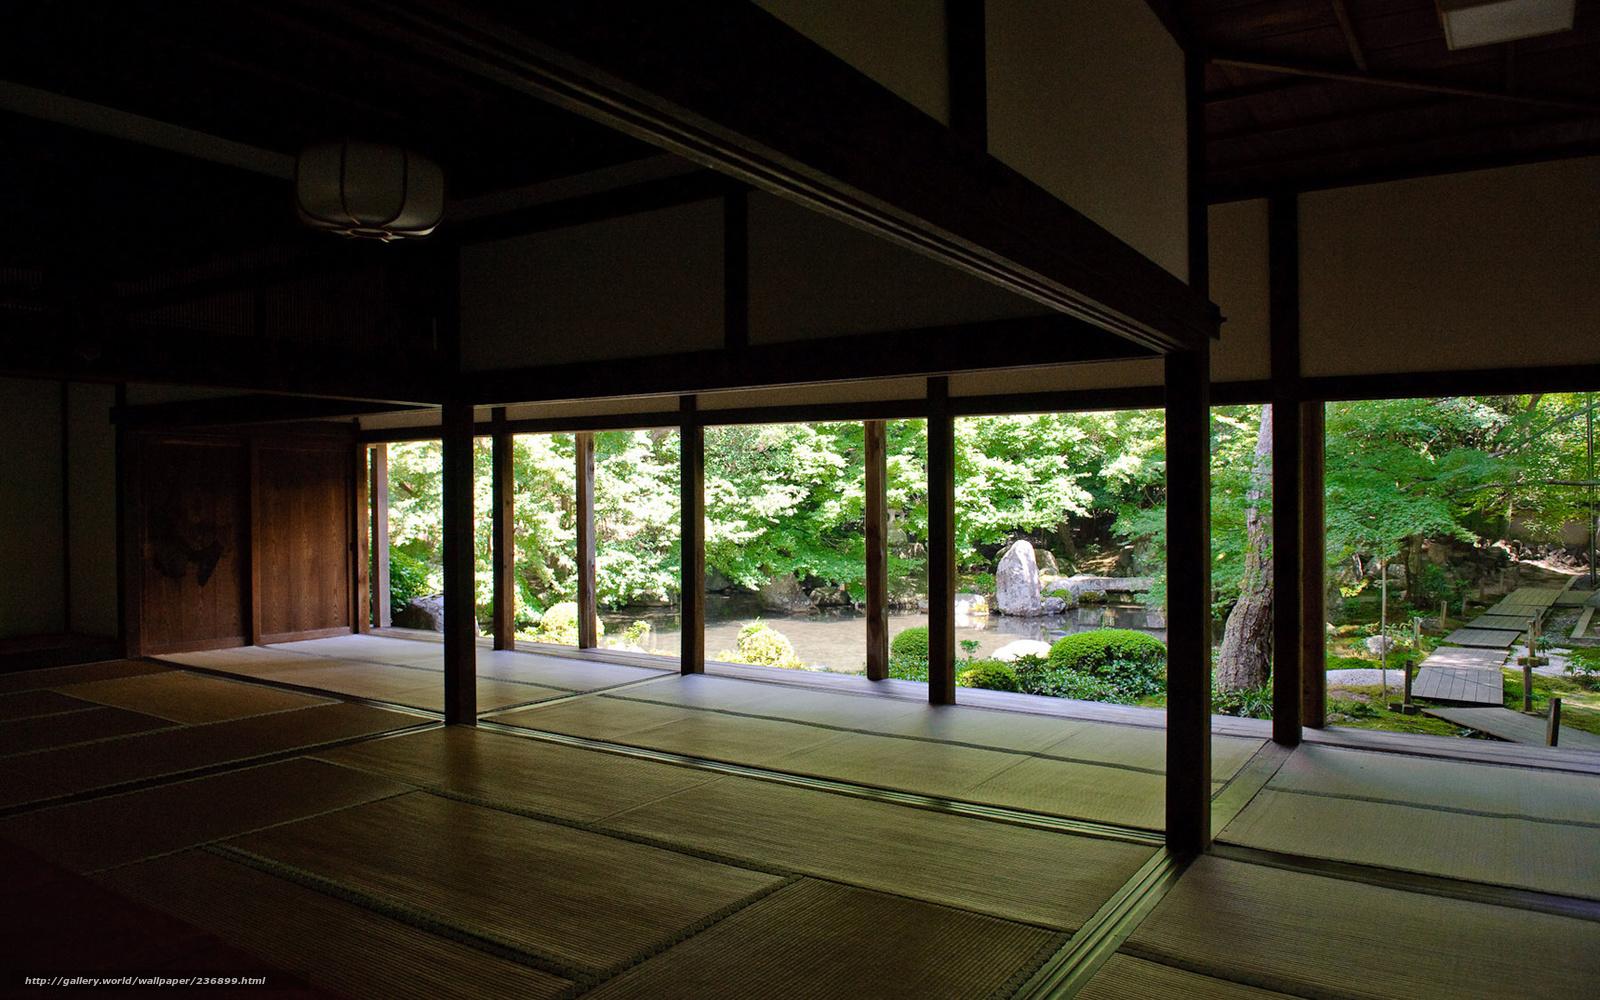 Tlcharger Fond decran maison, Japon, Mats, jardin Fonds decran ...